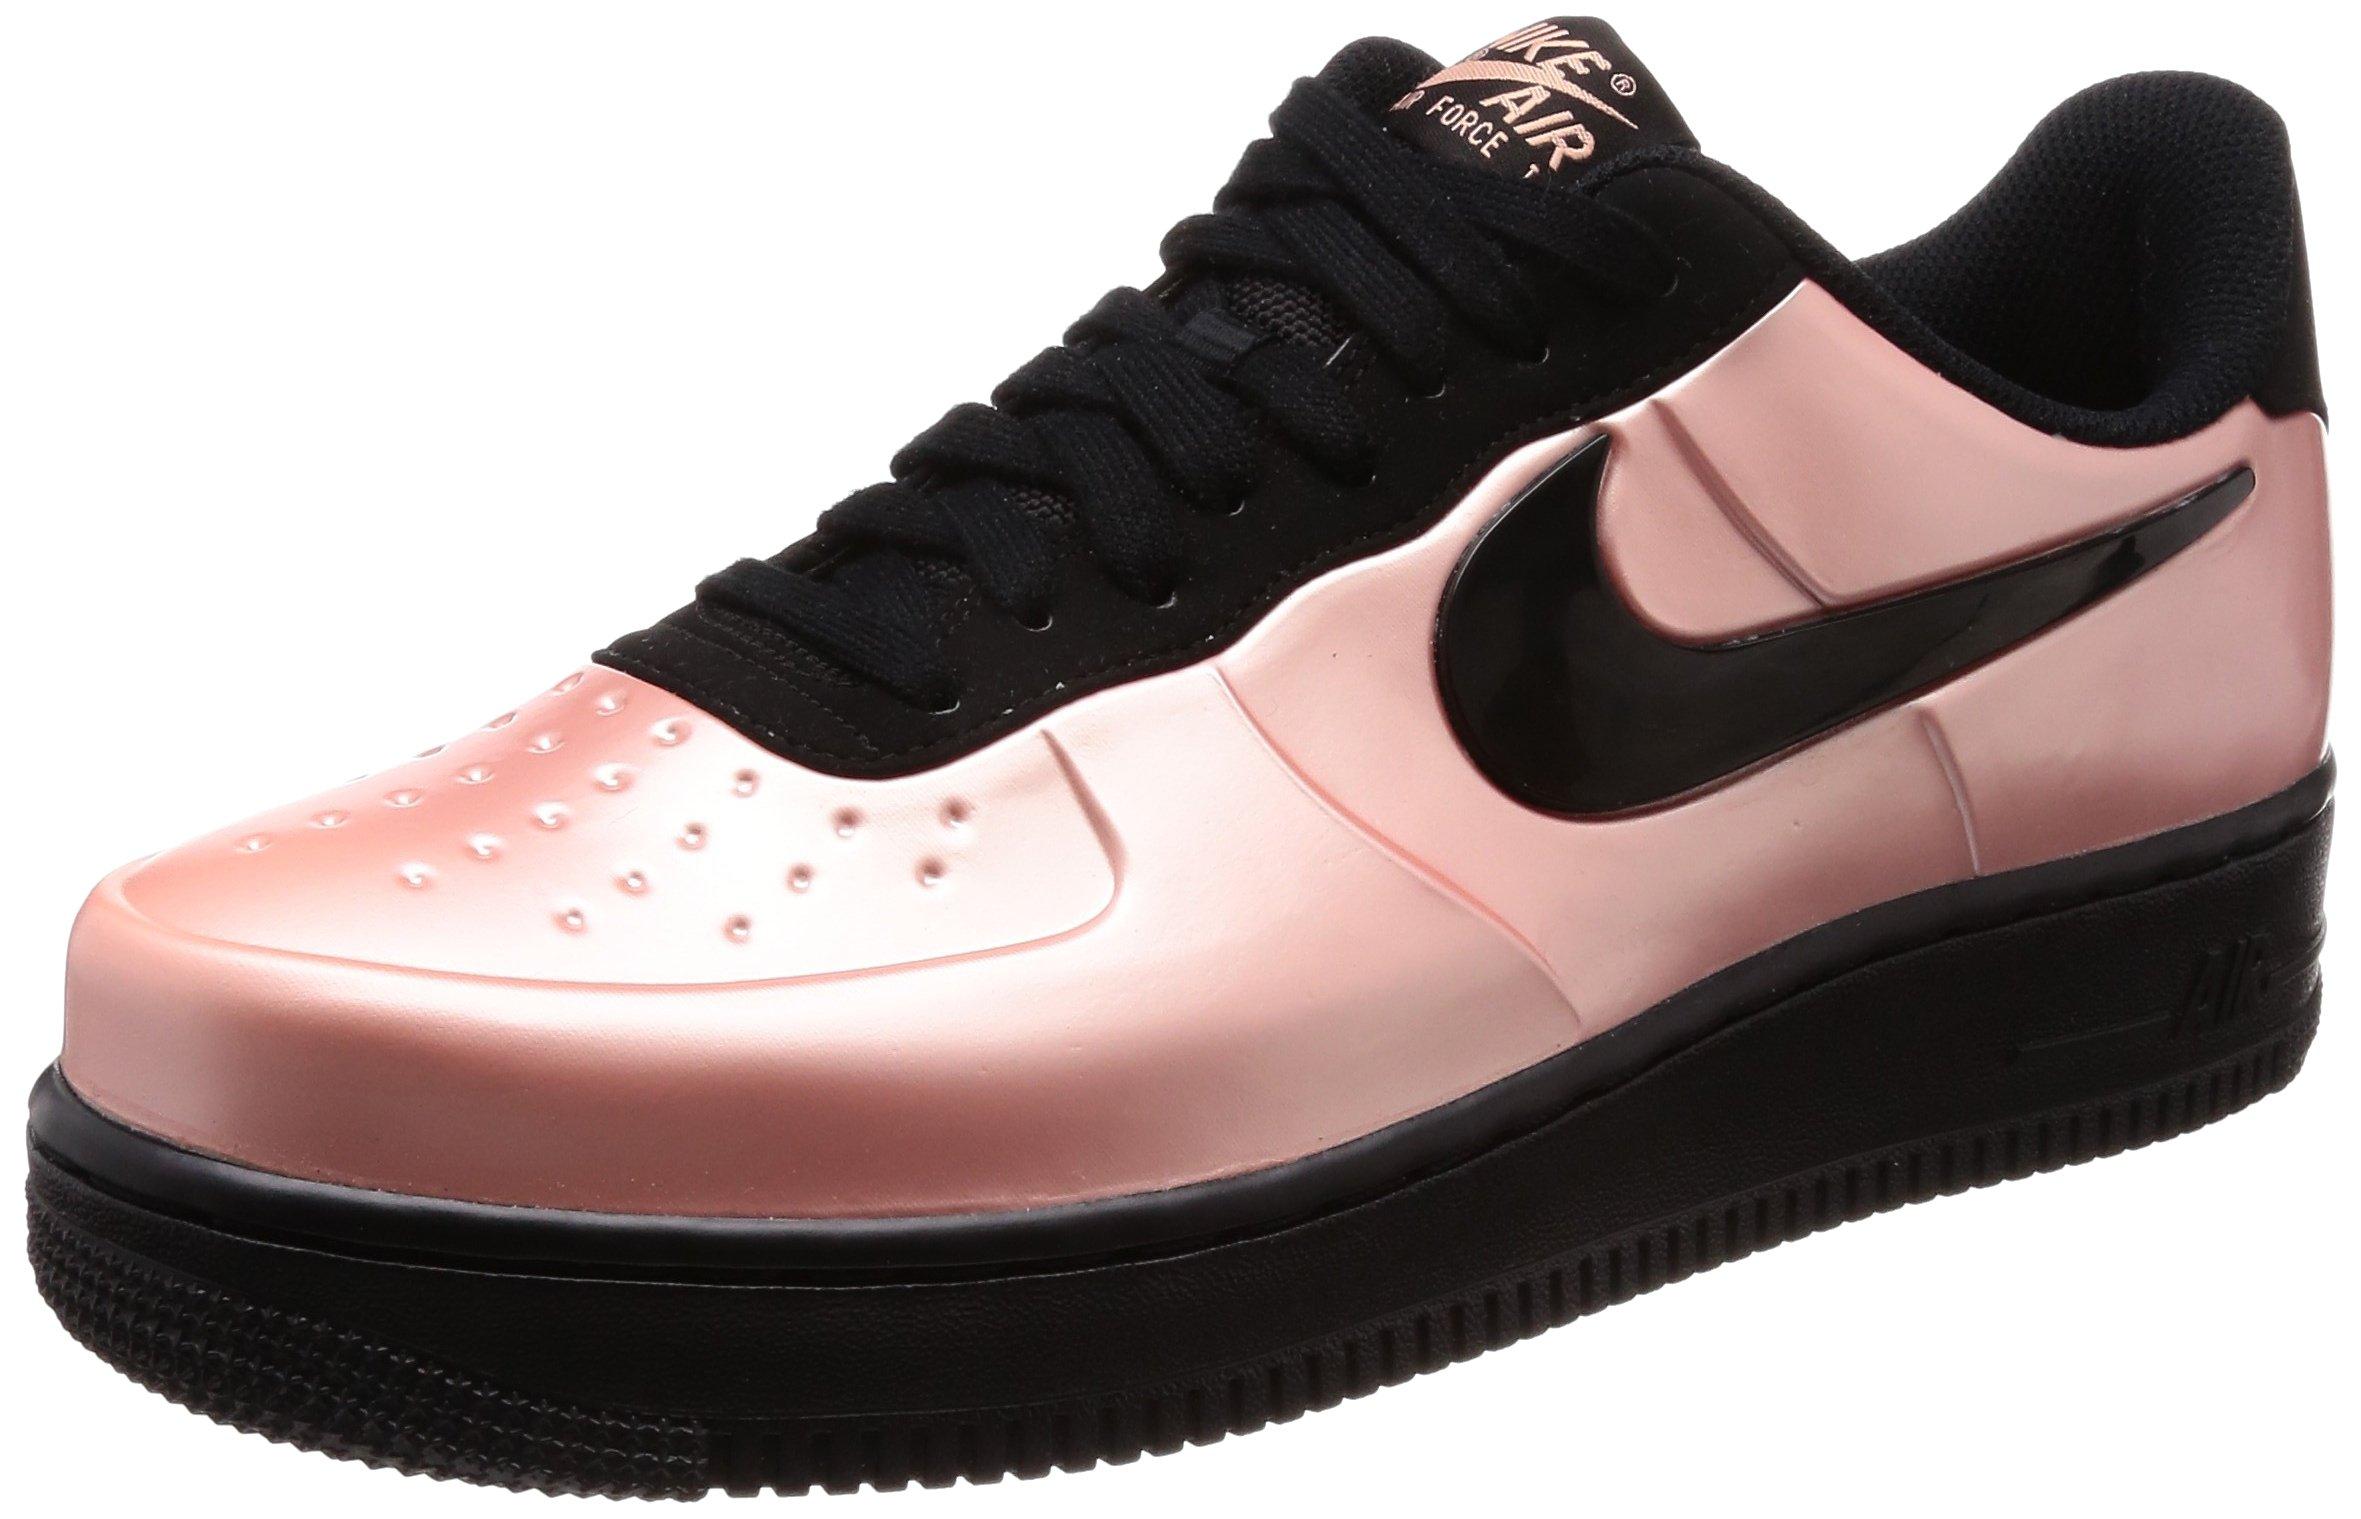 separation shoes dc72e 8fbb6 Galleon - Nike Men s Air Force 1 Foamposite Pro Cup Coral Stardust  AJ3664-600 (Size  7.5)